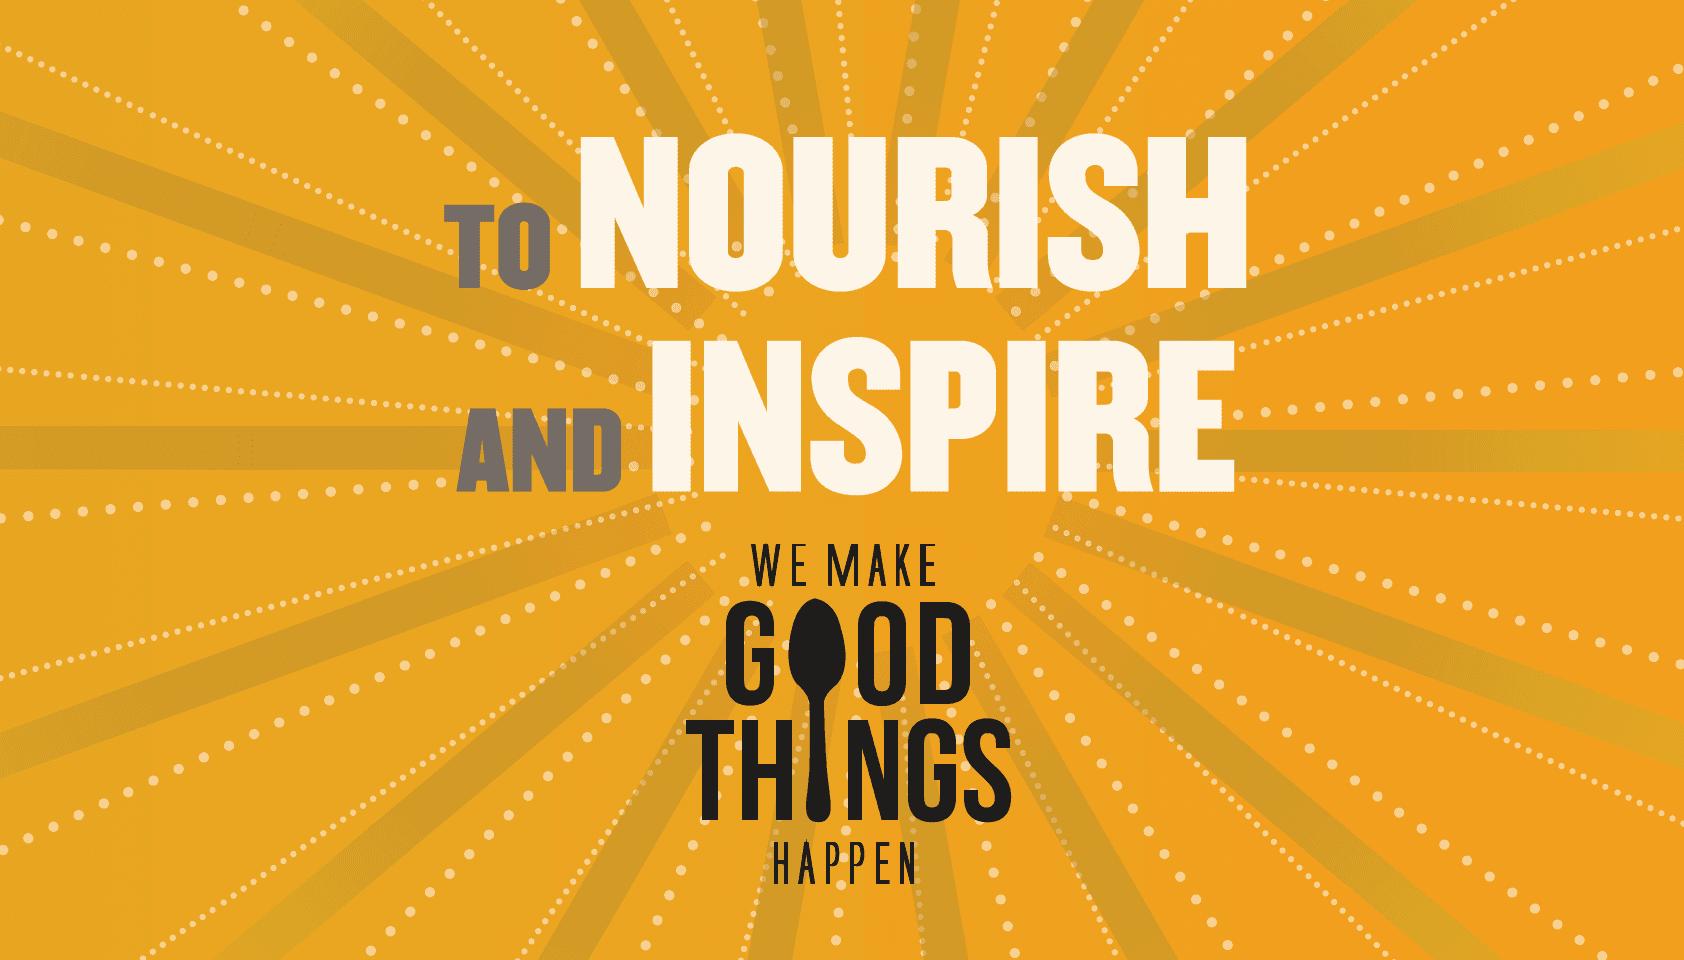 Nourish and inspire header